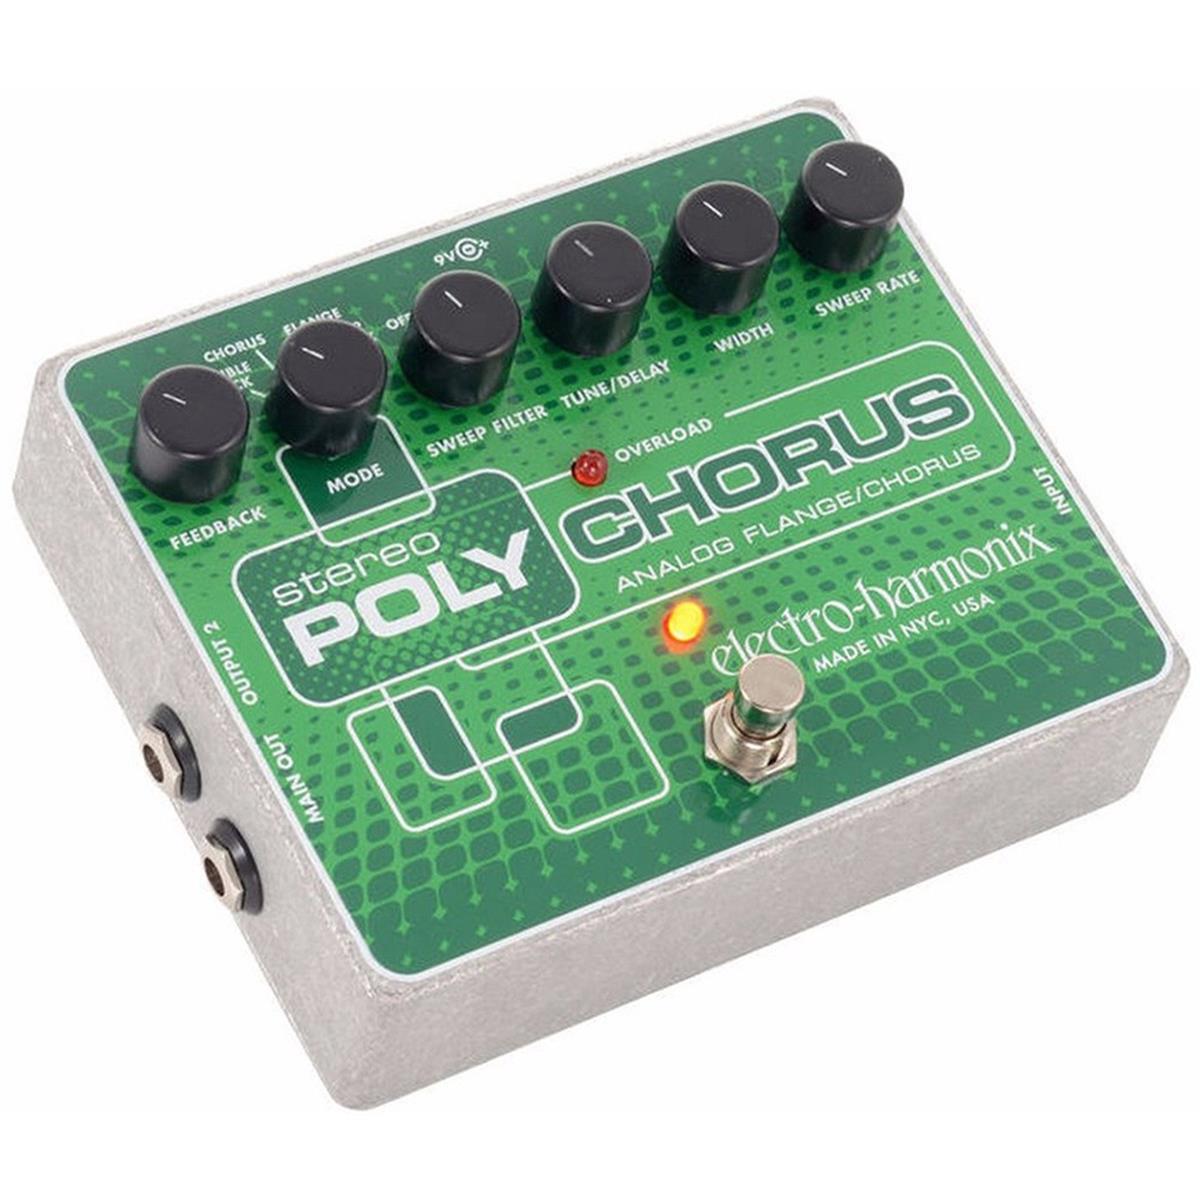 ELECTRO-HARMONIX-STEREO-POLYCHORUS-Analog-Chorus-Flanger-Slapback-Echo-24DC-100-PSU-included-sku-41253193